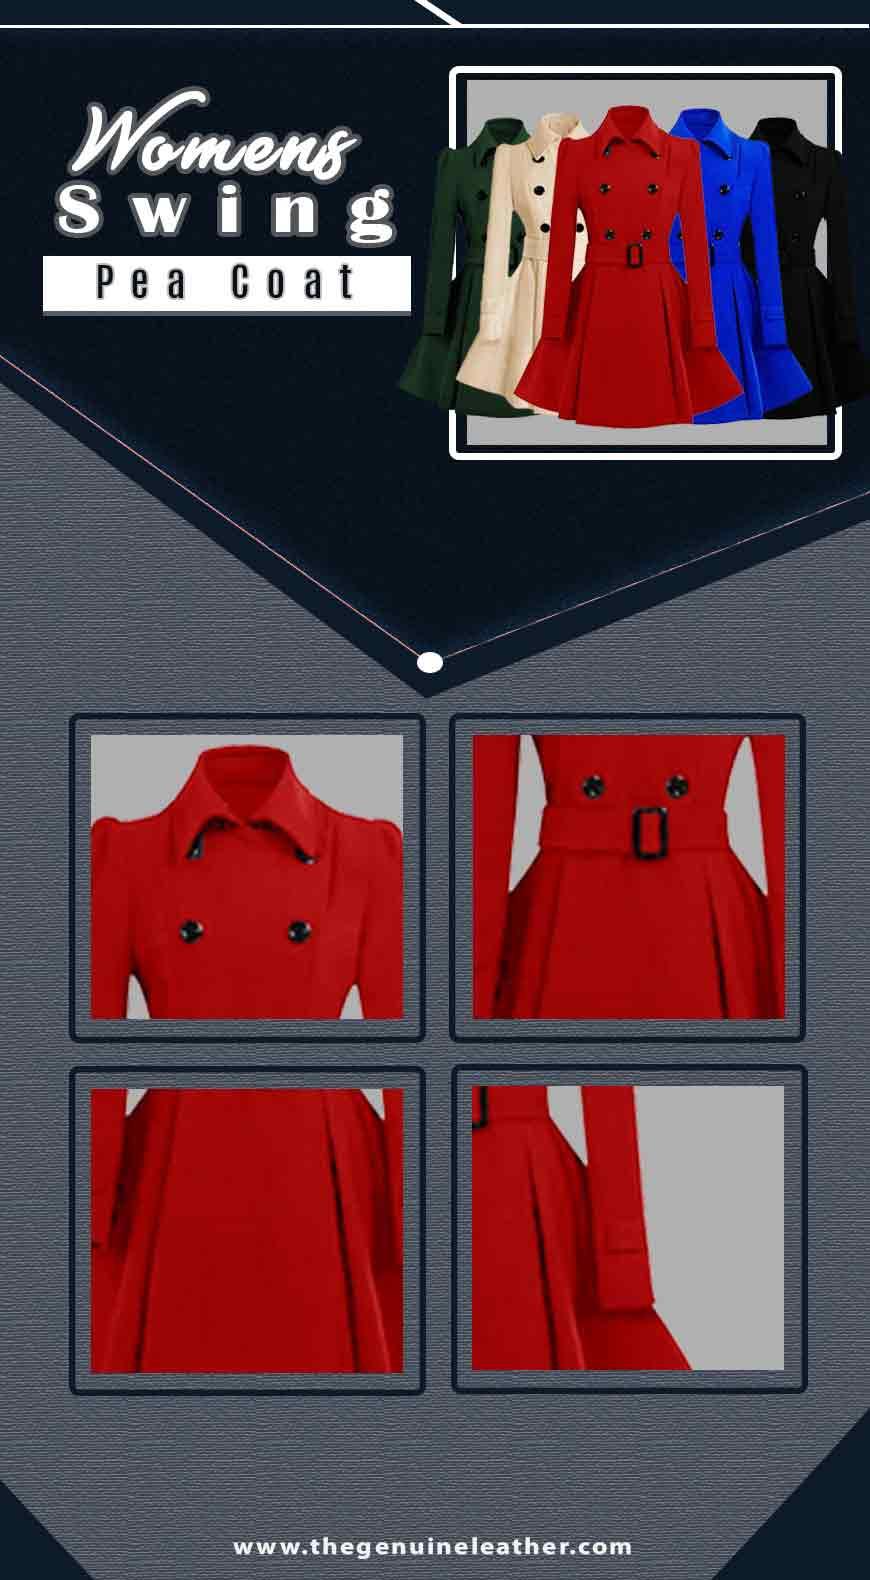 Womens Swing Pea Coat Infographic